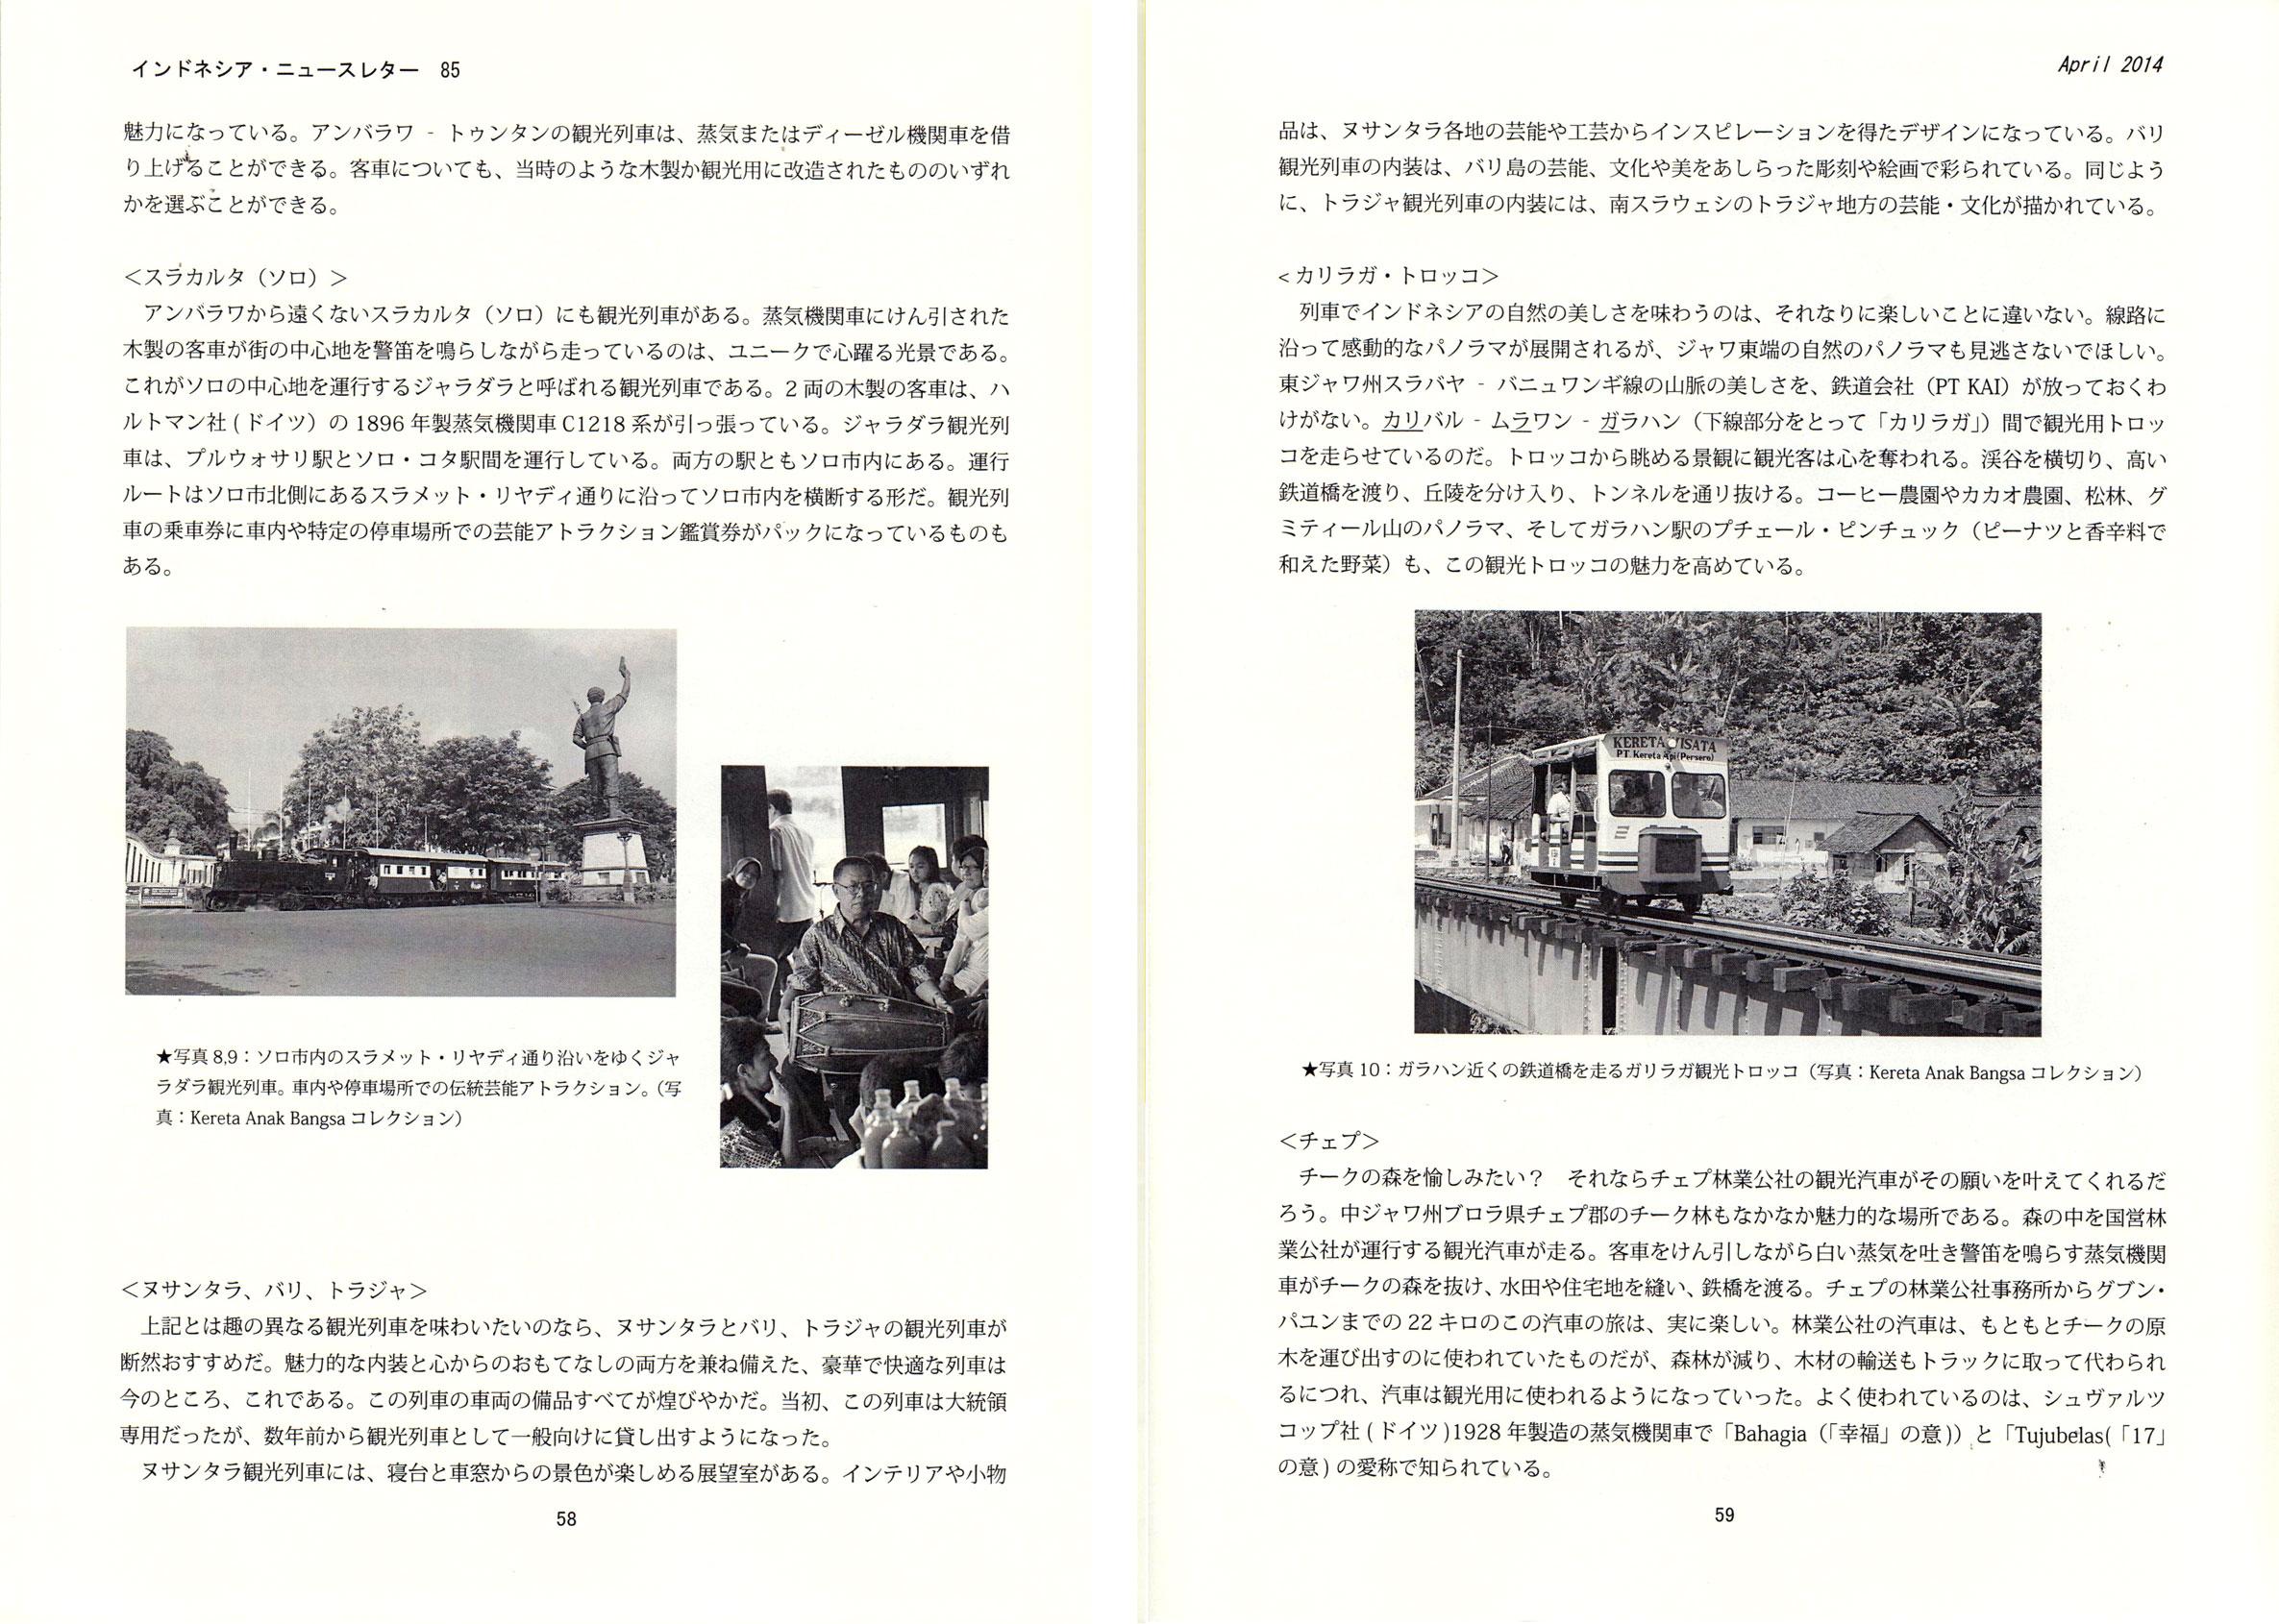 Halaman 58-59